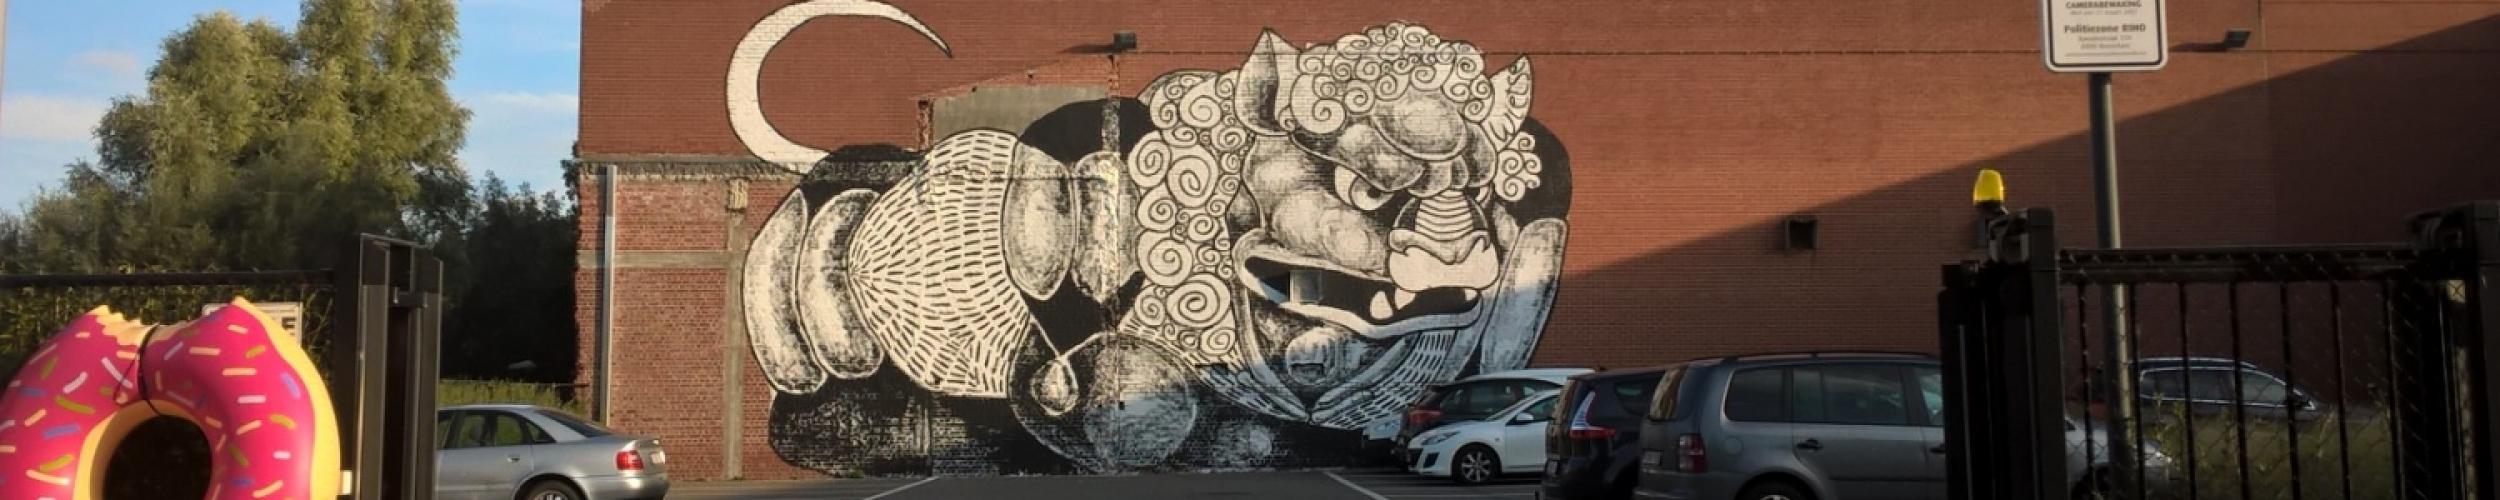 Graffitimuur Zwarte-Leeuwstraat